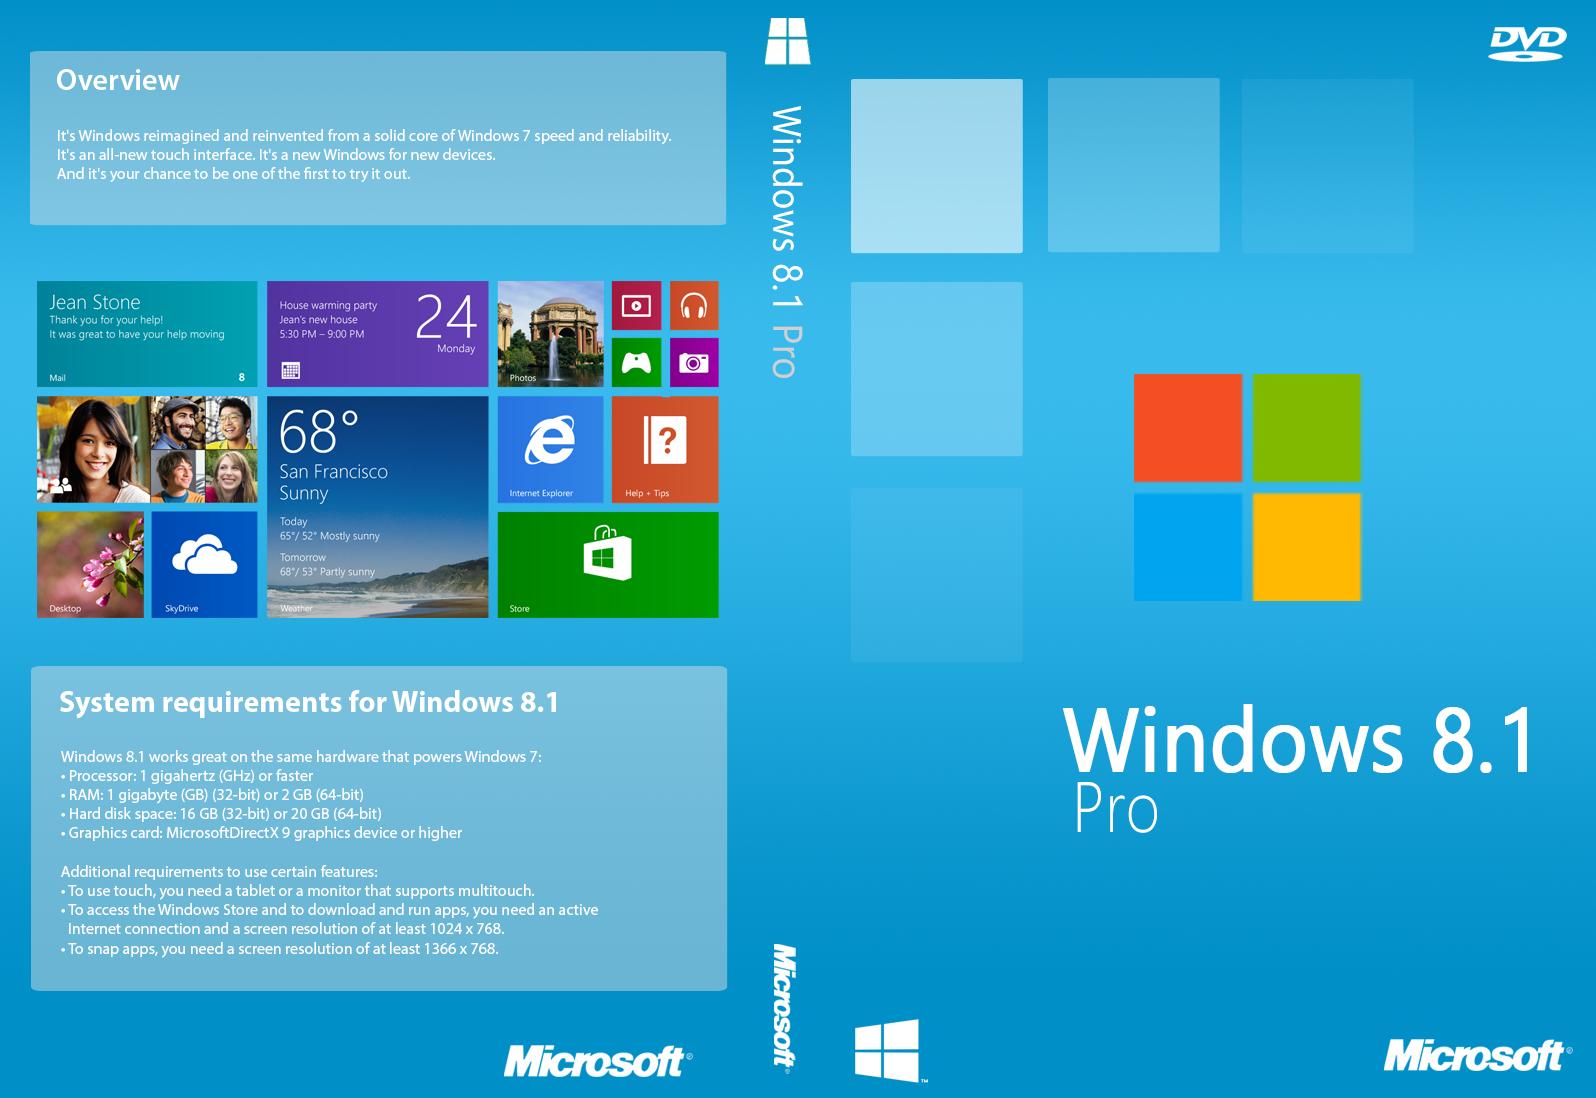 descargar windows 10 gratis en espanol completo 32 bits utorrent